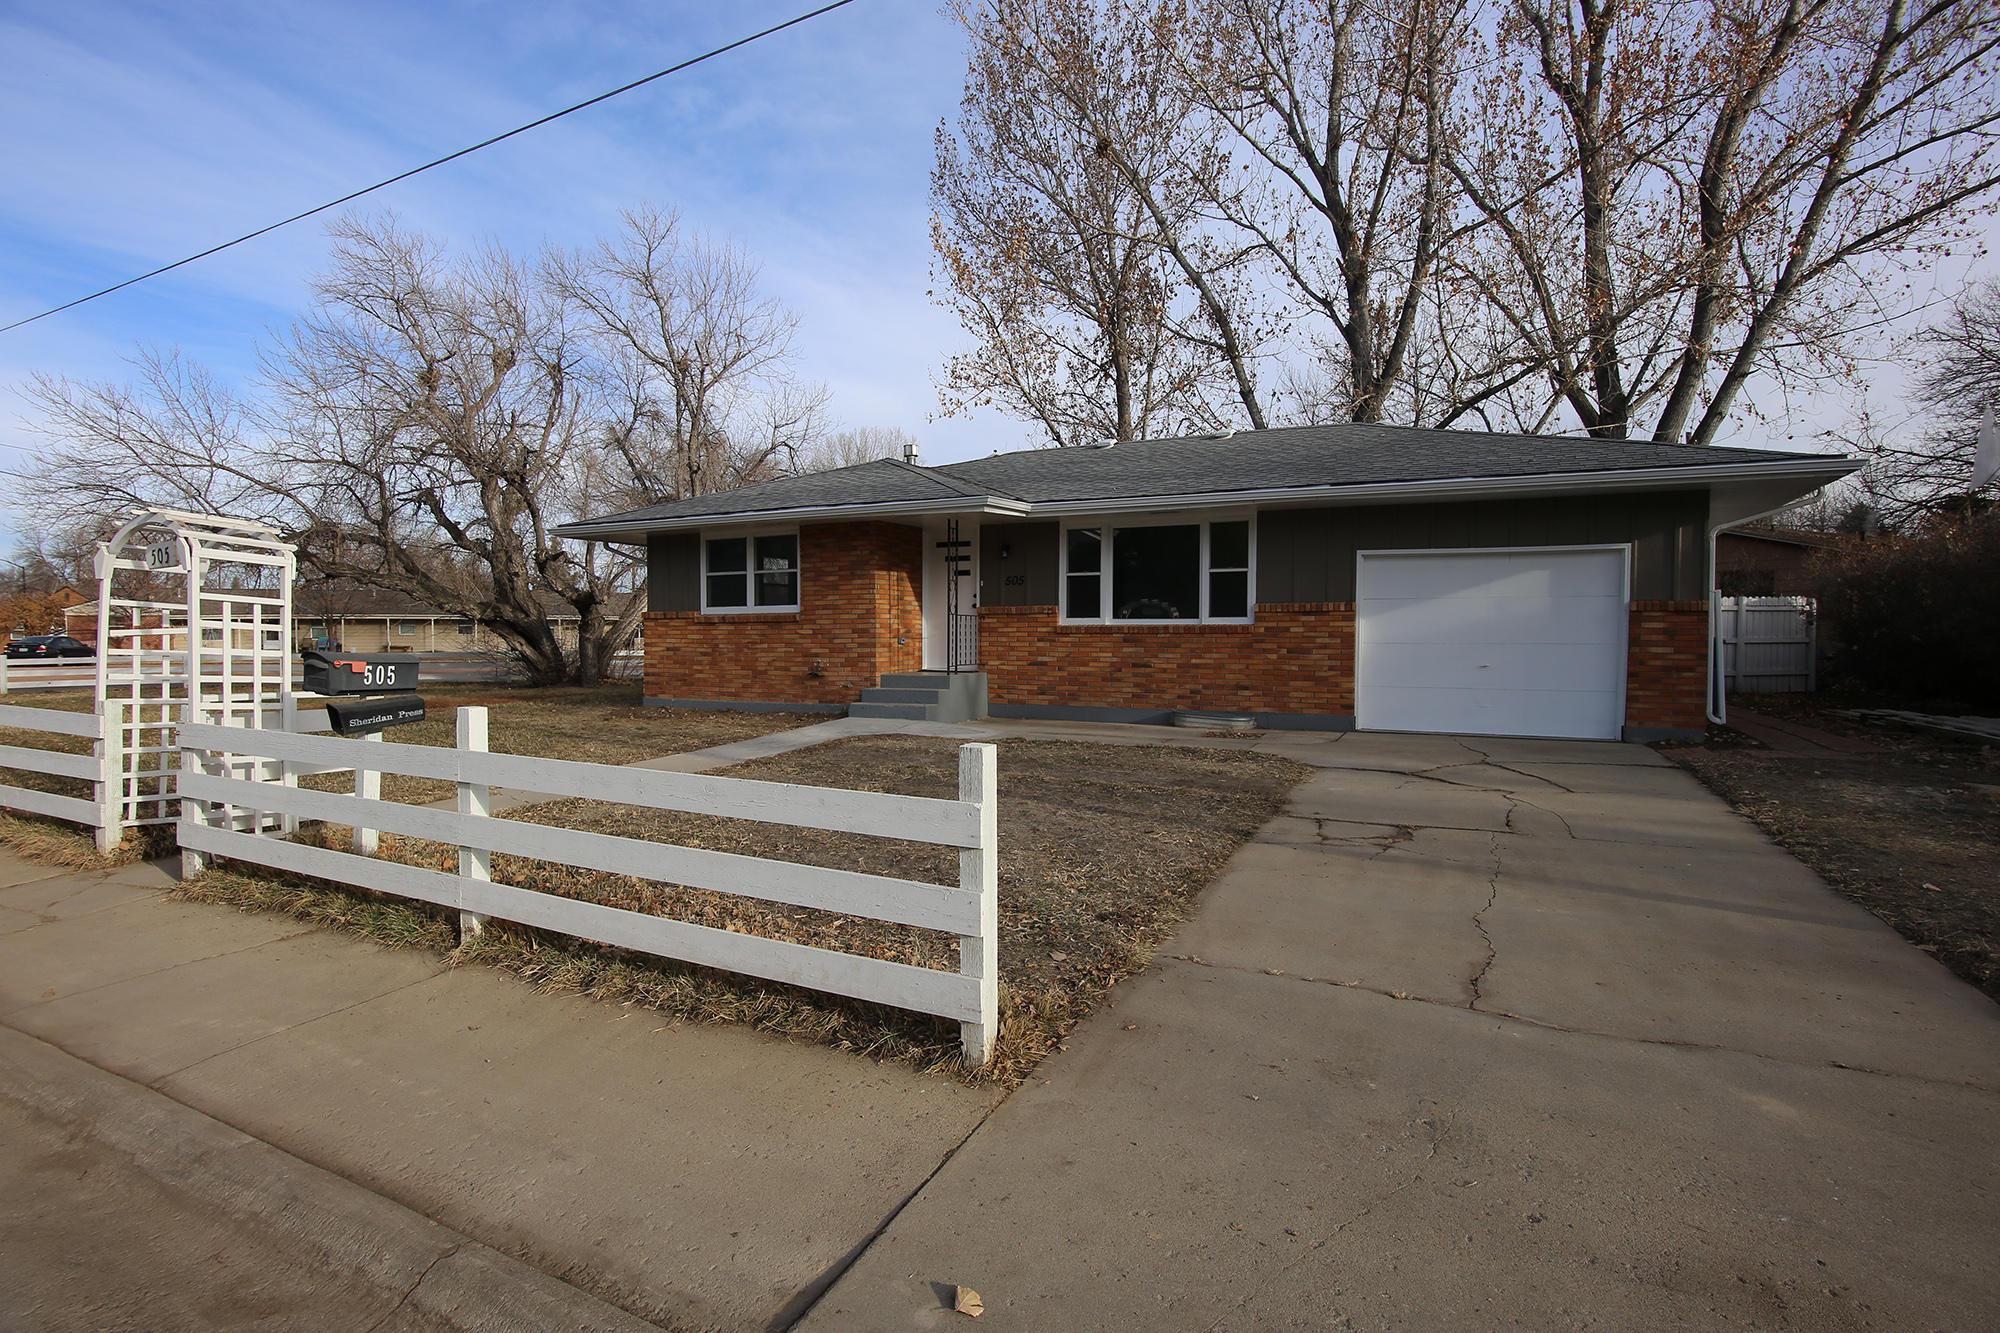 505 Wyoming Avenue, Sheridan, Wyoming 82801, 3 Bedrooms Bedrooms, ,1 BathroomBathrooms,Residential,For Sale,Wyoming,20-1178